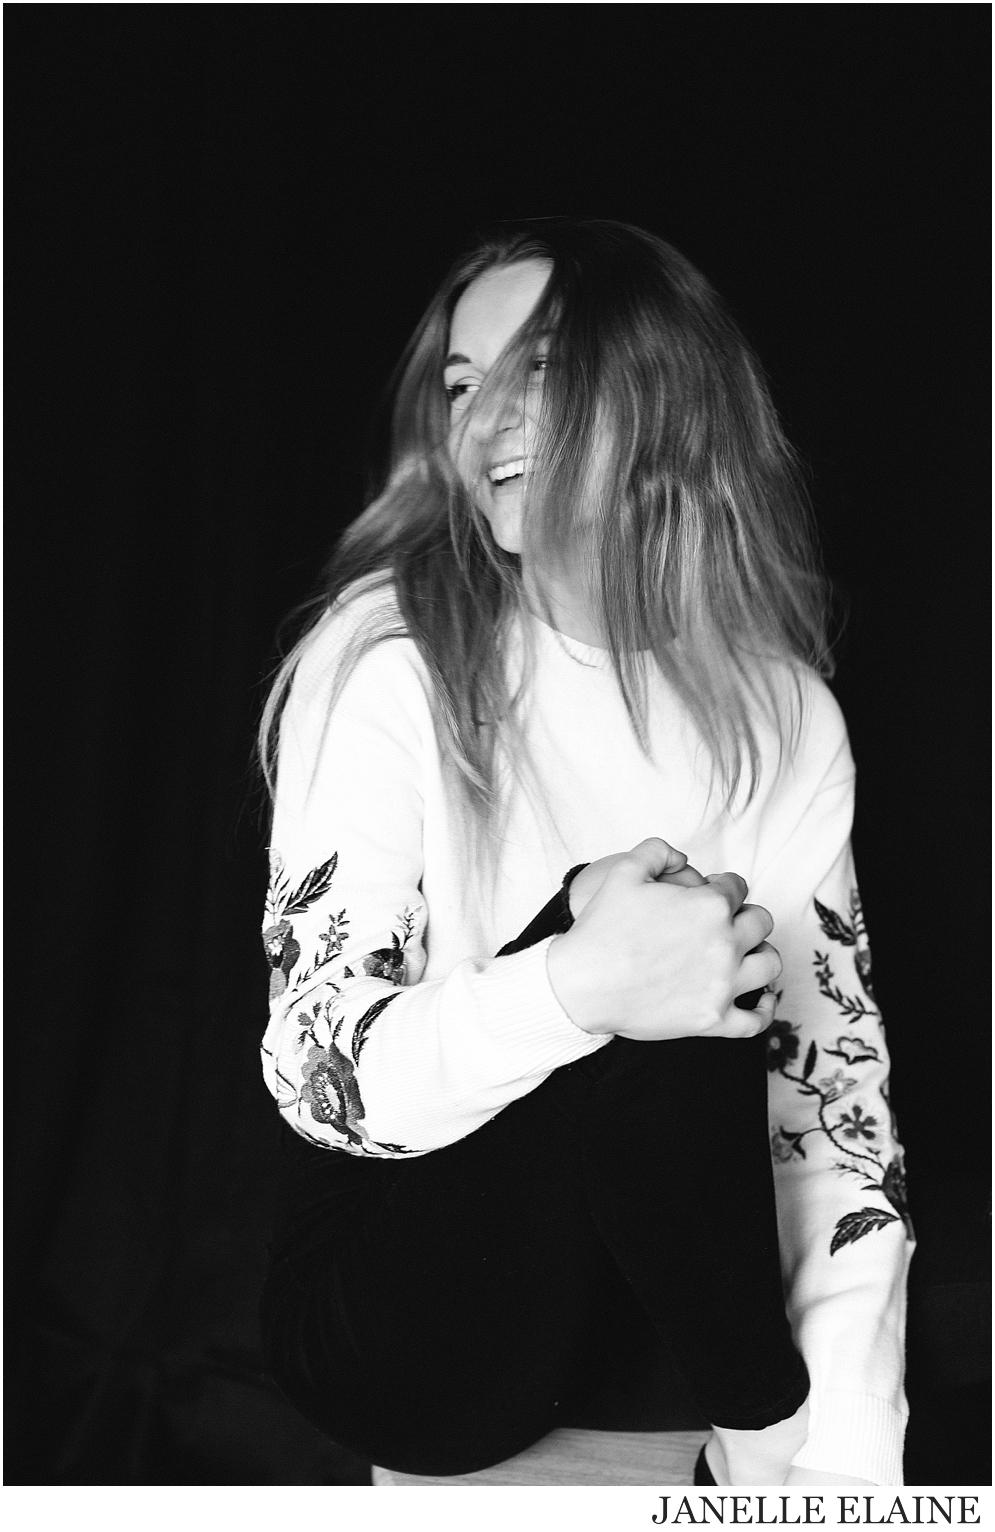 kirsi-seattle-wa-portrait photography-janelle elaine photography-43.jpg